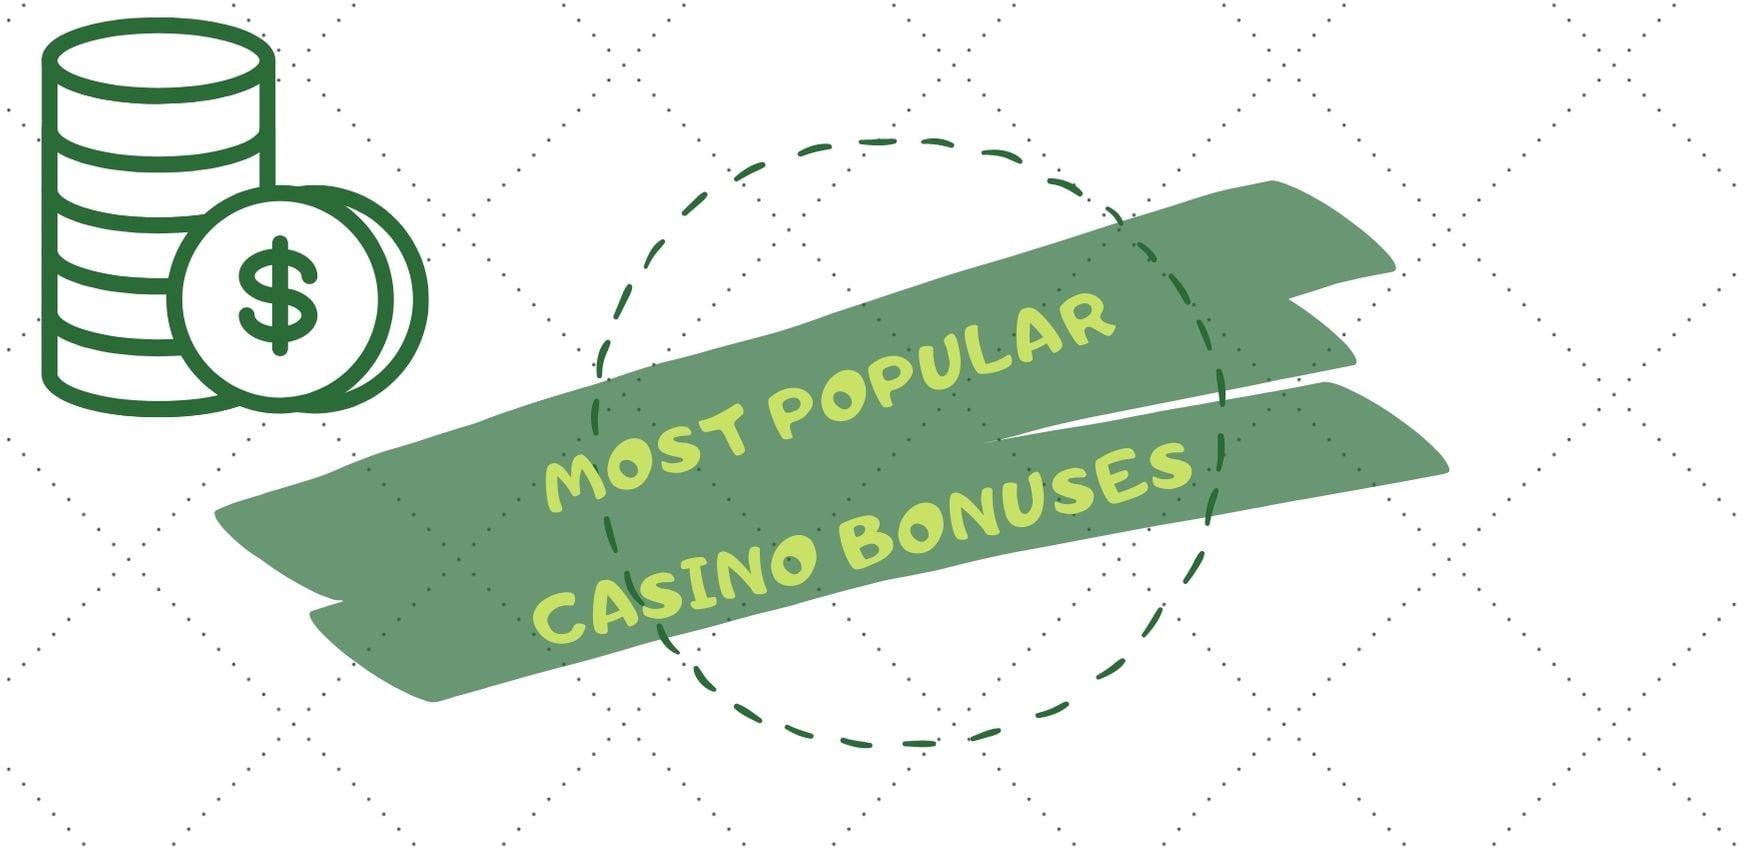 Most Popular Casino Bonuses